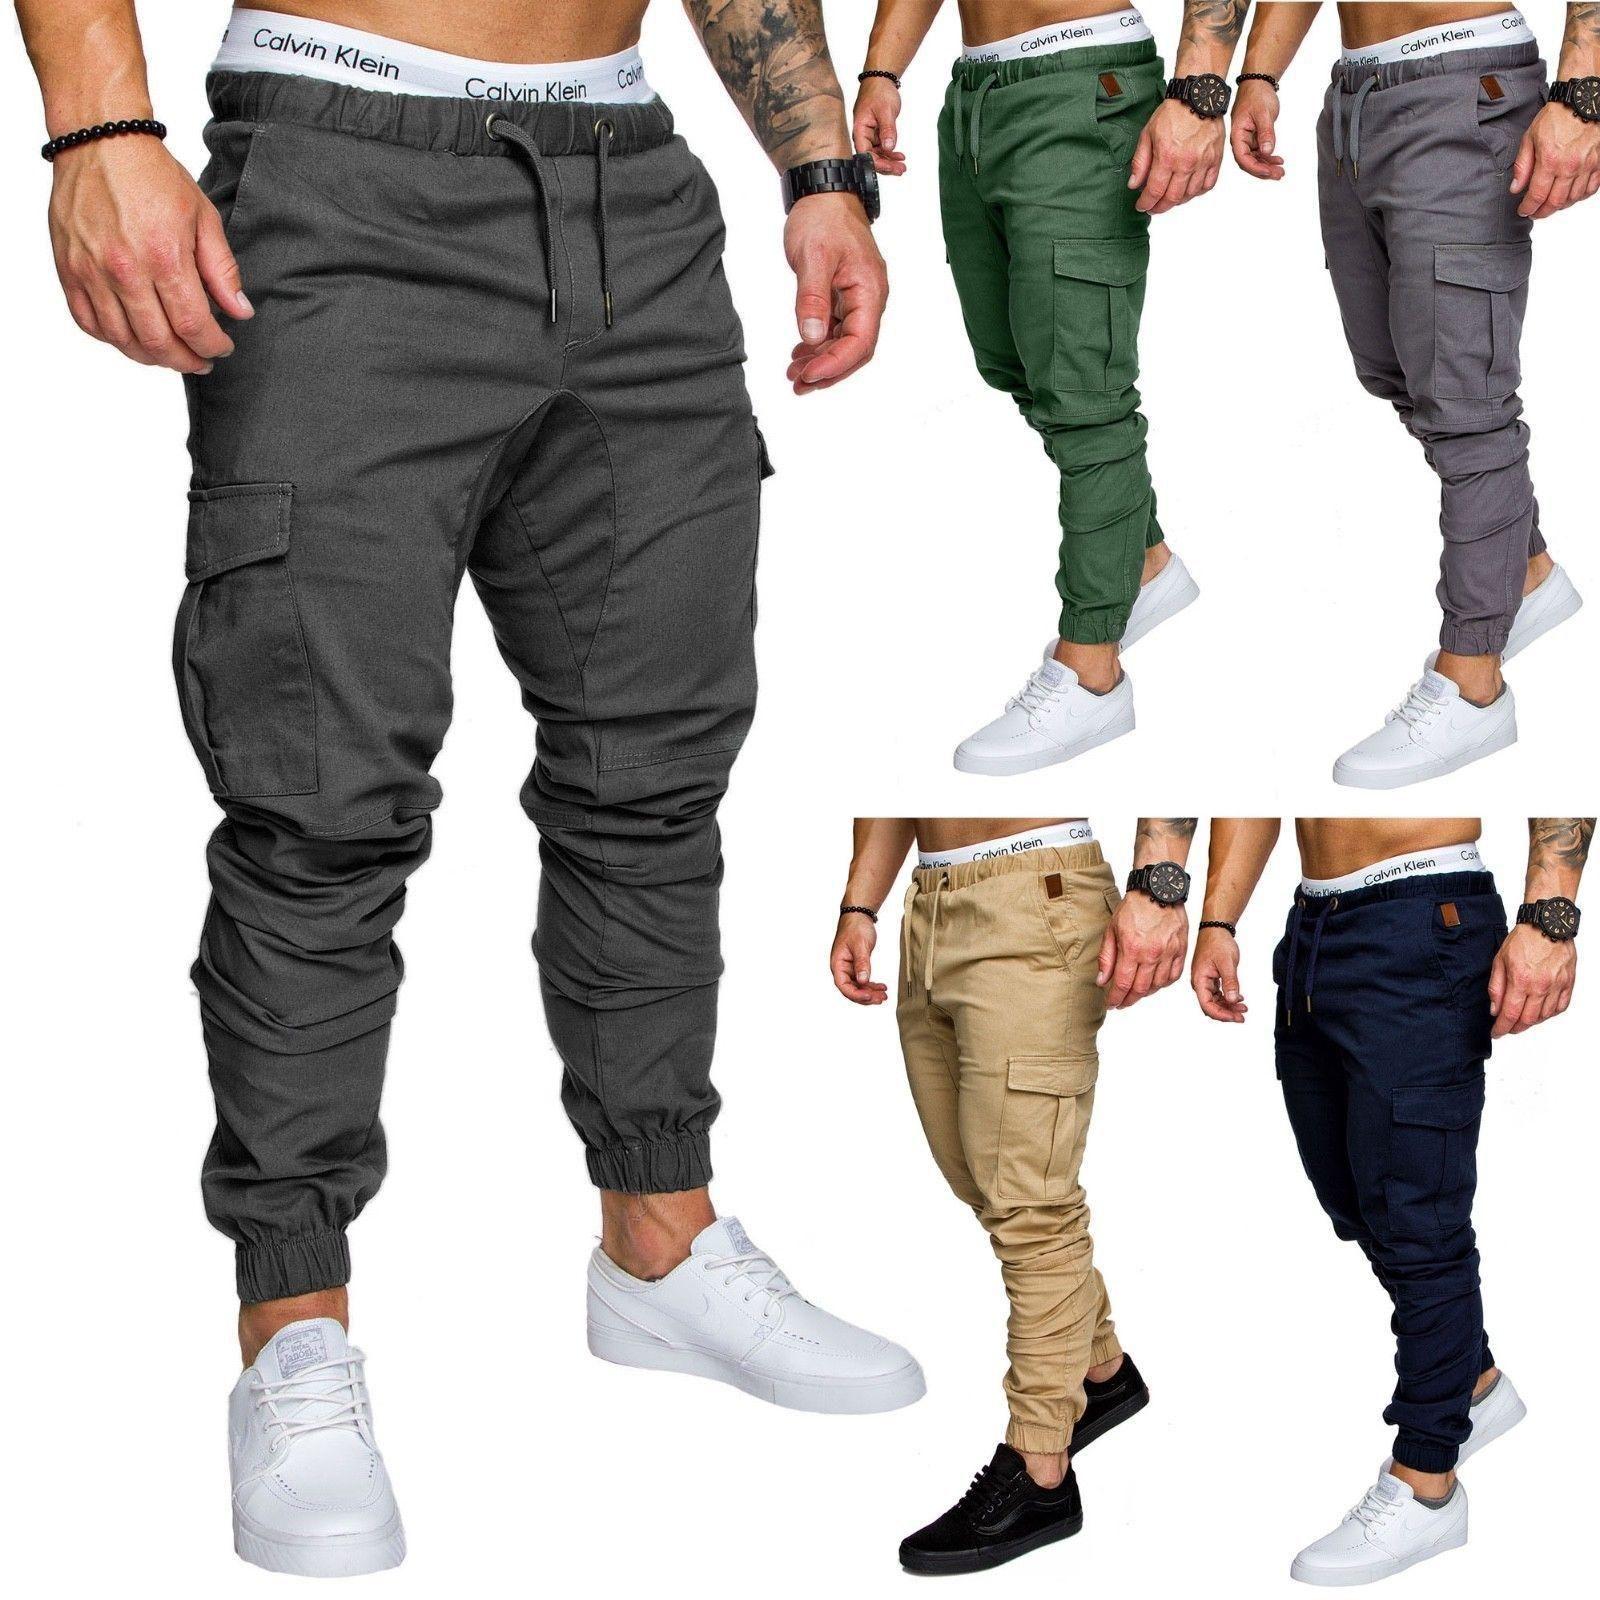 Brand Autumn Men Pants Hip Hop Harem Joggers Pants New Male Trousers Mens Solid Multi-pocket Cargo Pants Skinny Fit Sweatpants